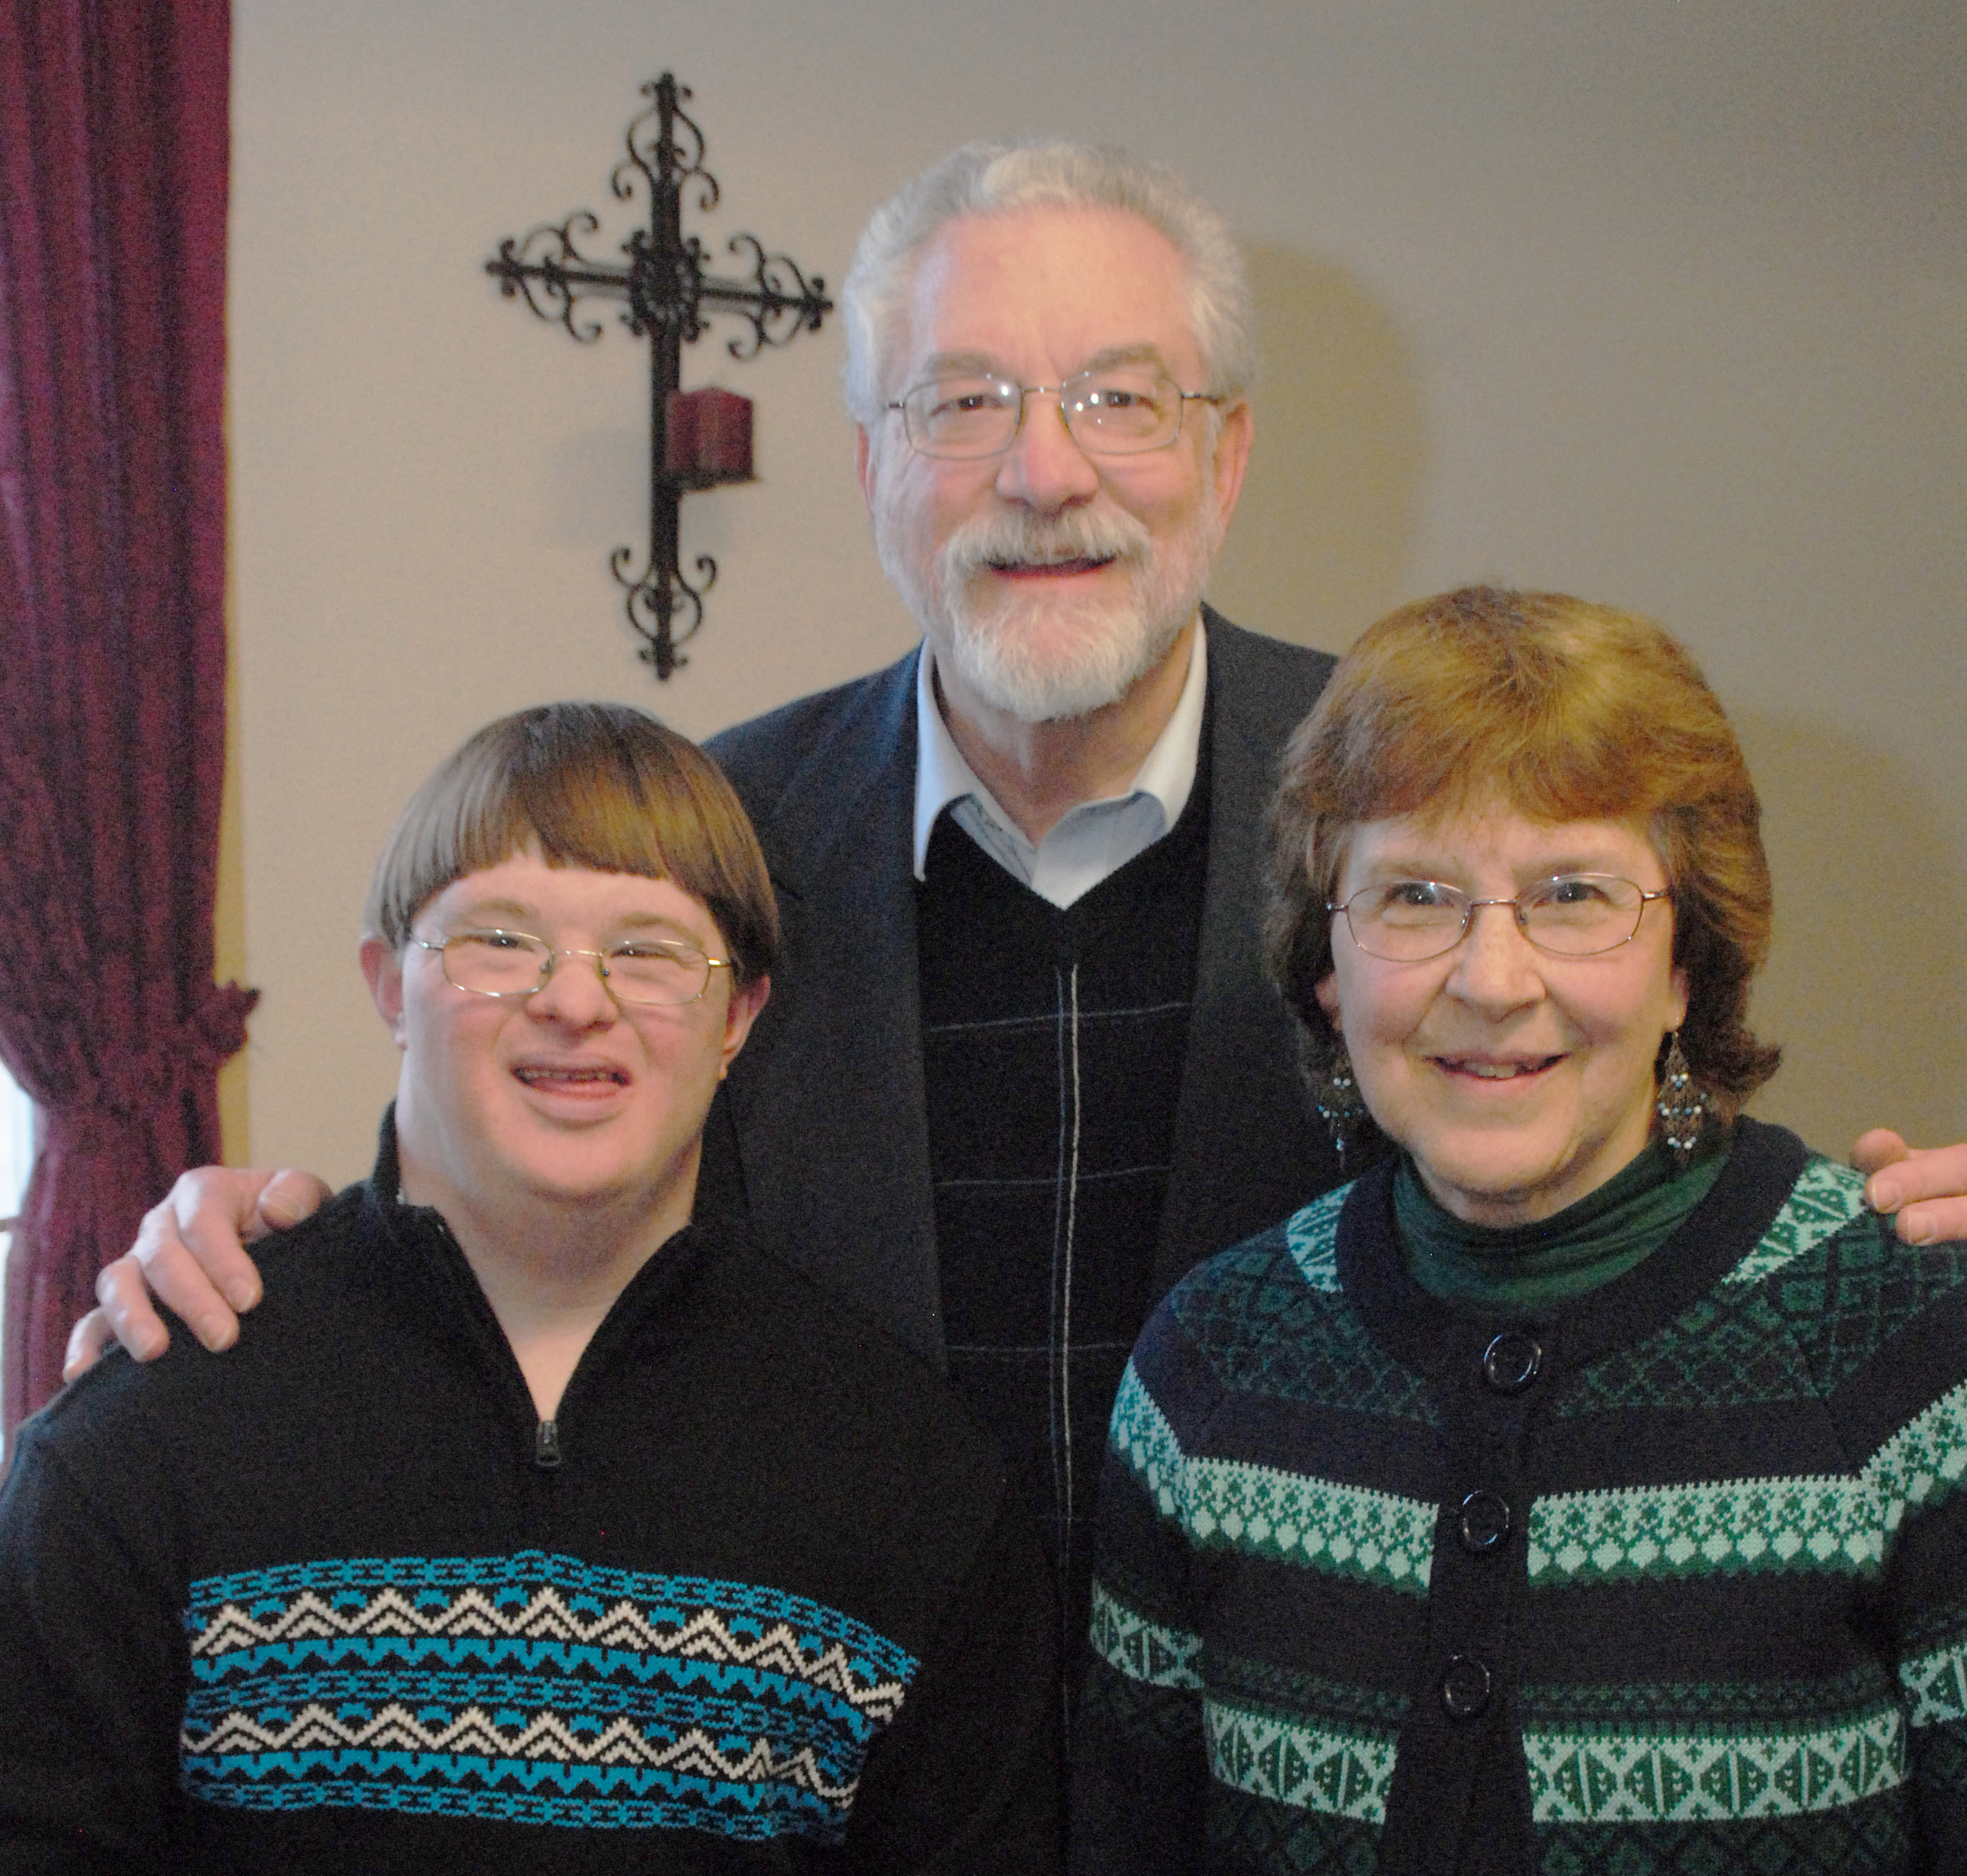 Dennis Reiter, Associate Pastor